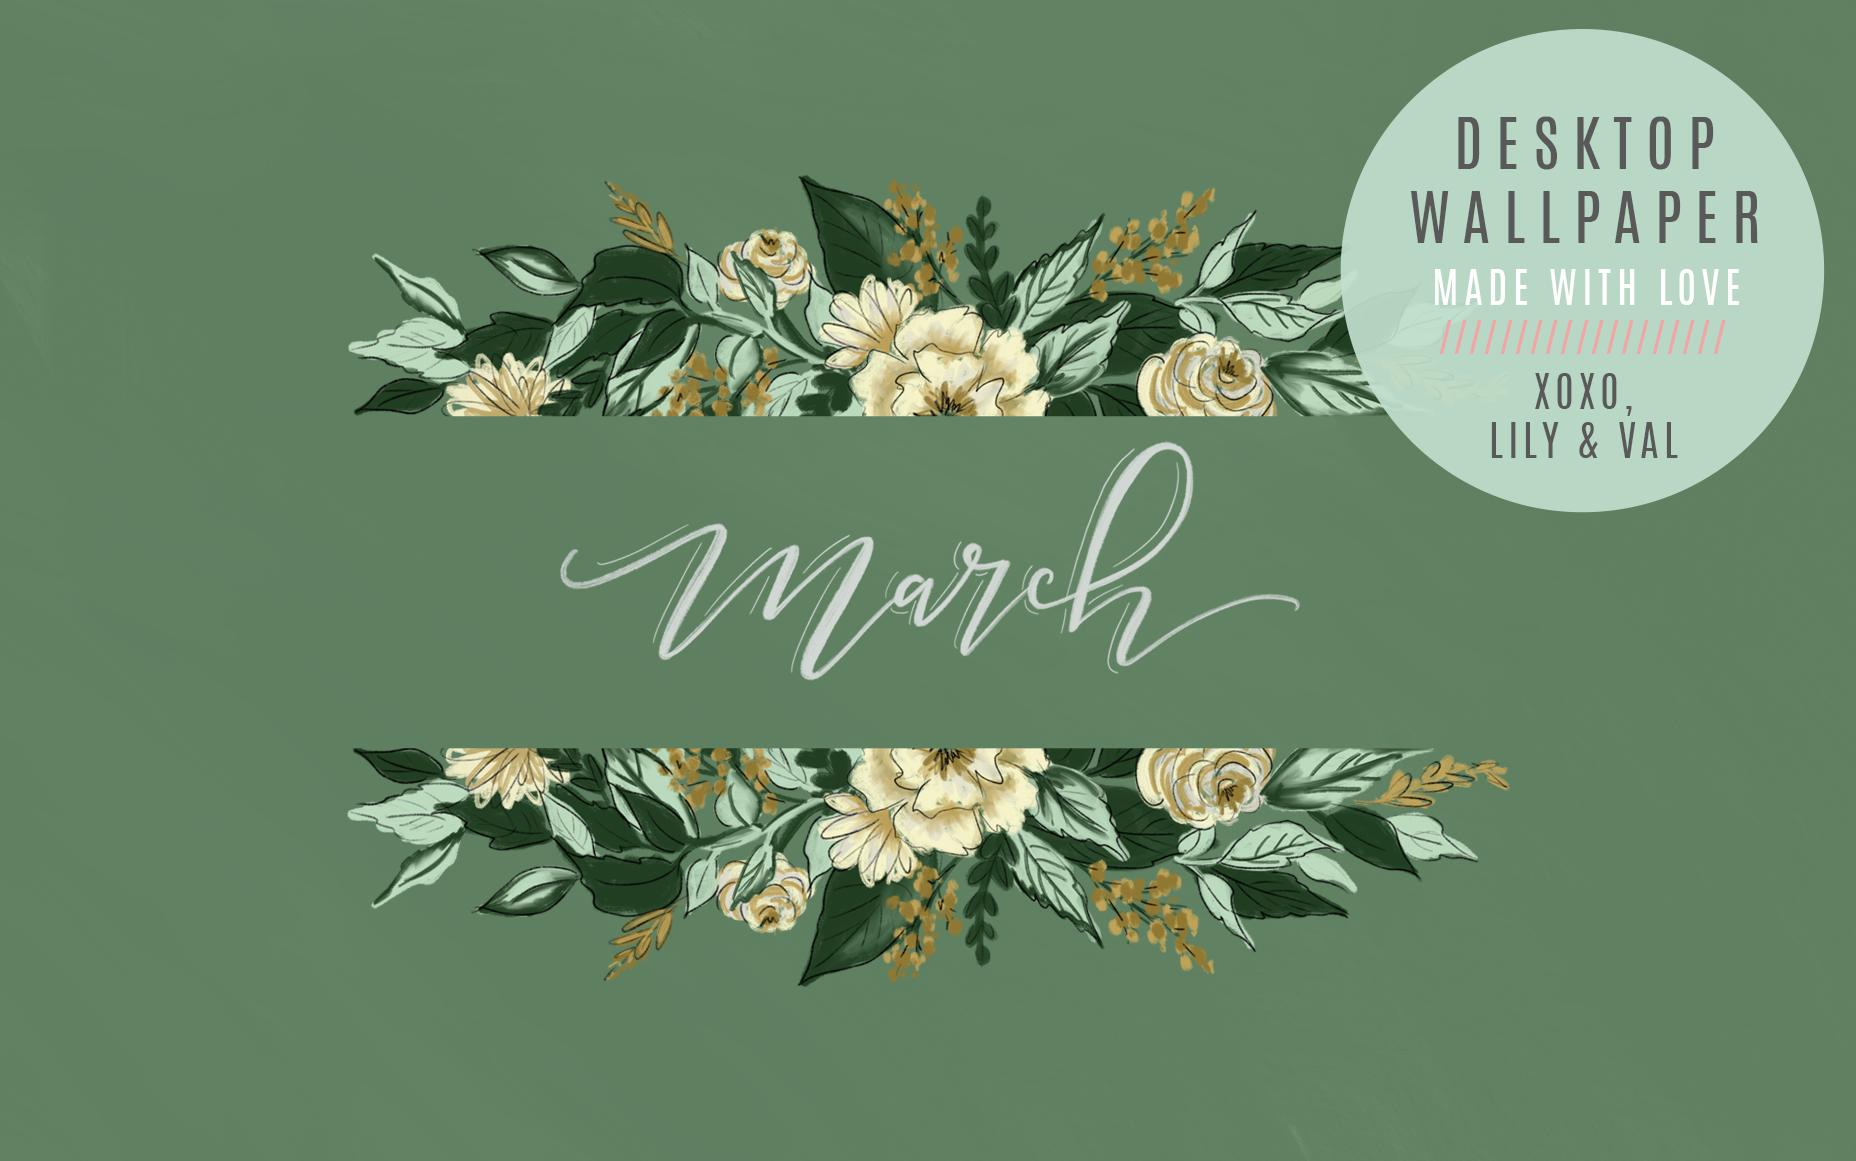 March 39 s green floral free desktop wallpaper download - March desktop wallpaper ...